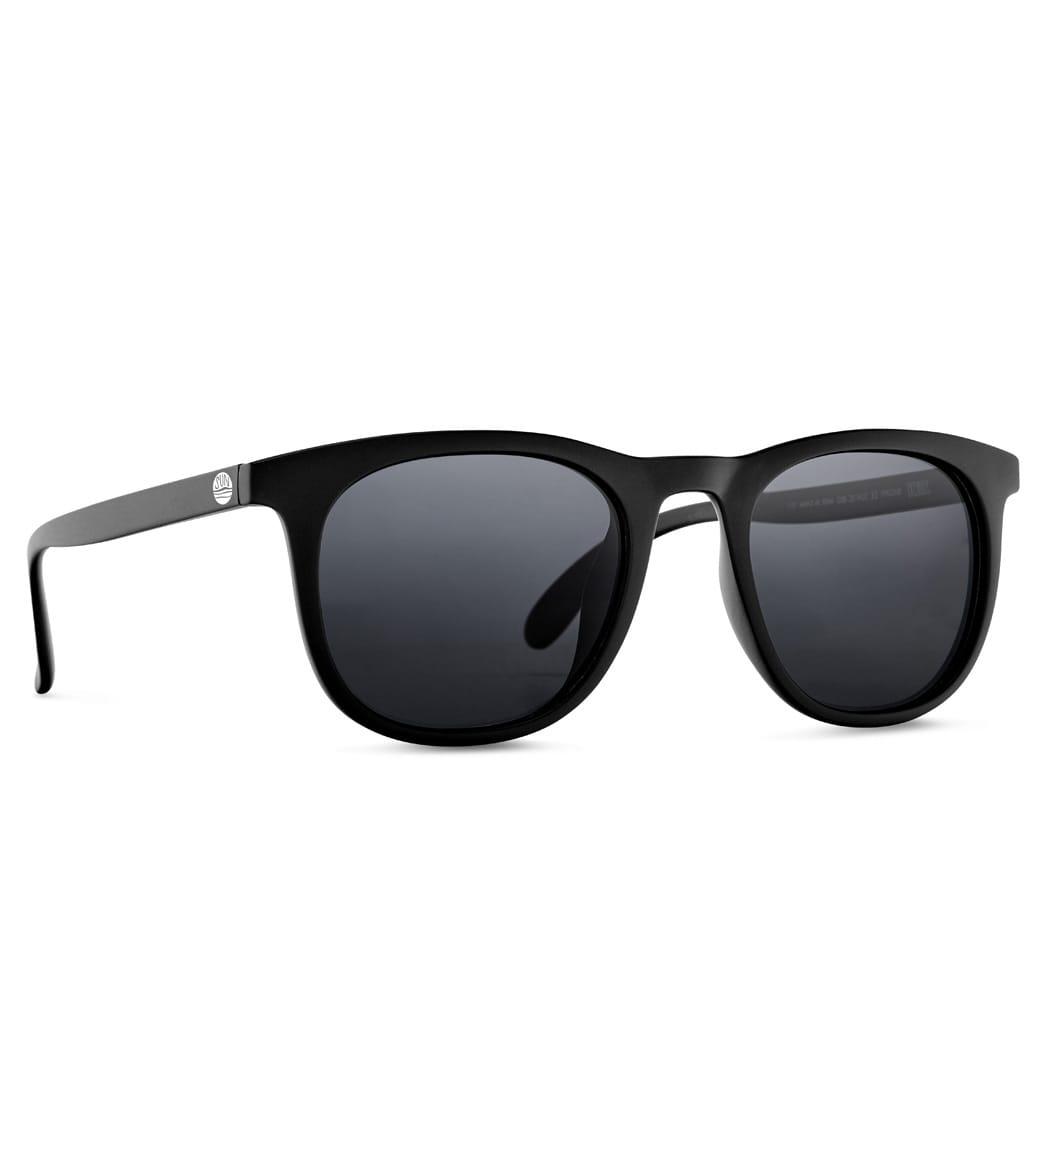 086abe1fb4 Sunski Seacliff Polarized Sunglasses at SwimOutlet.com - Free Shipping